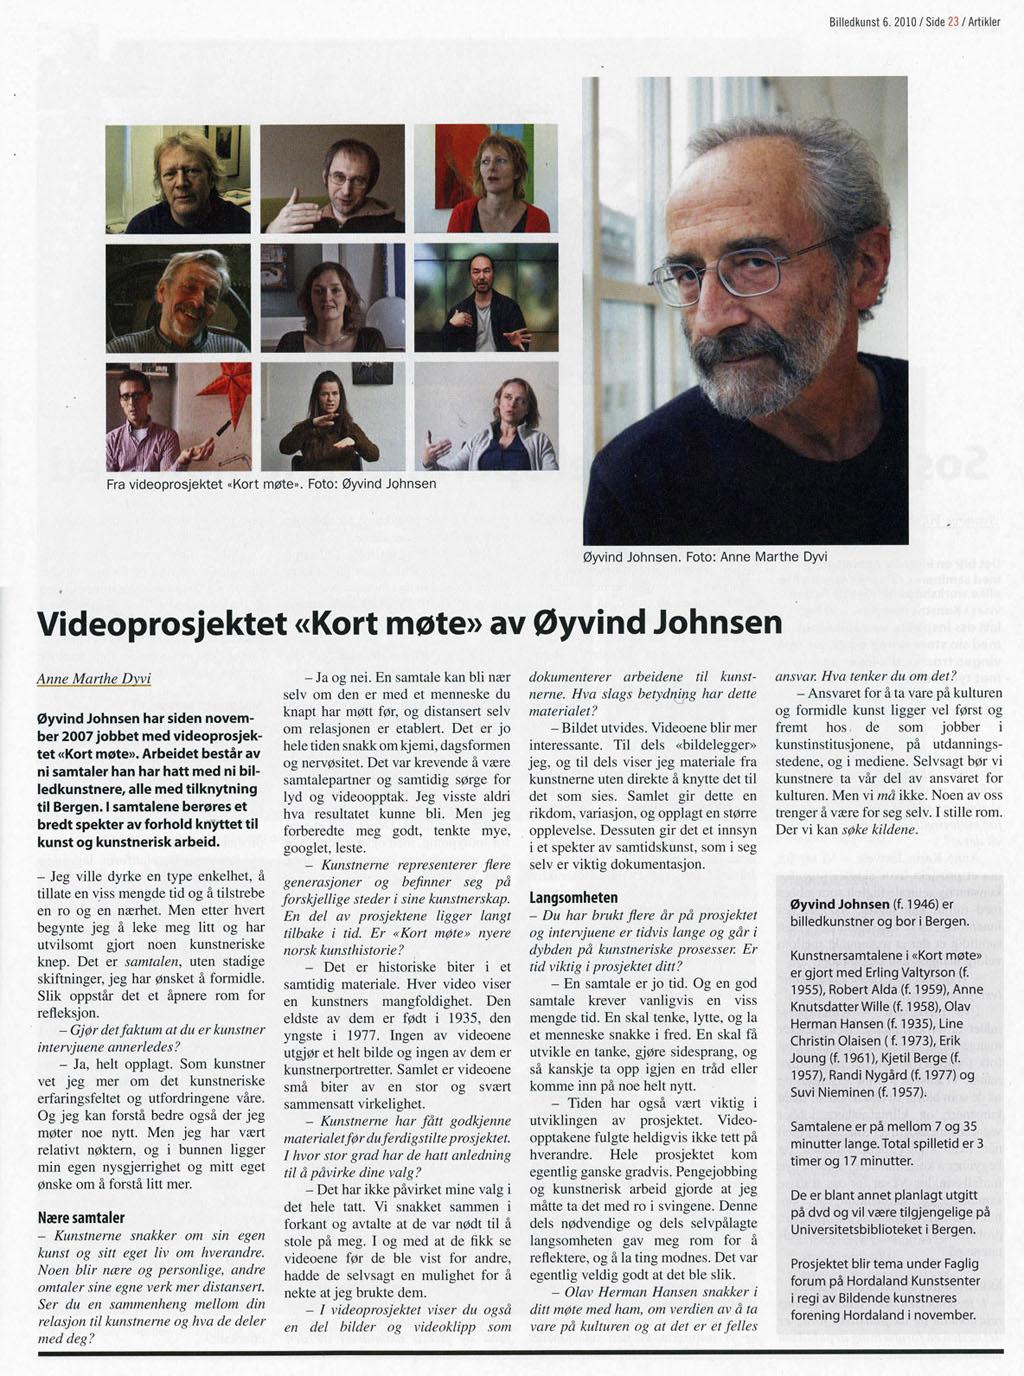 000ny 2010-interview-Billedkunst-2